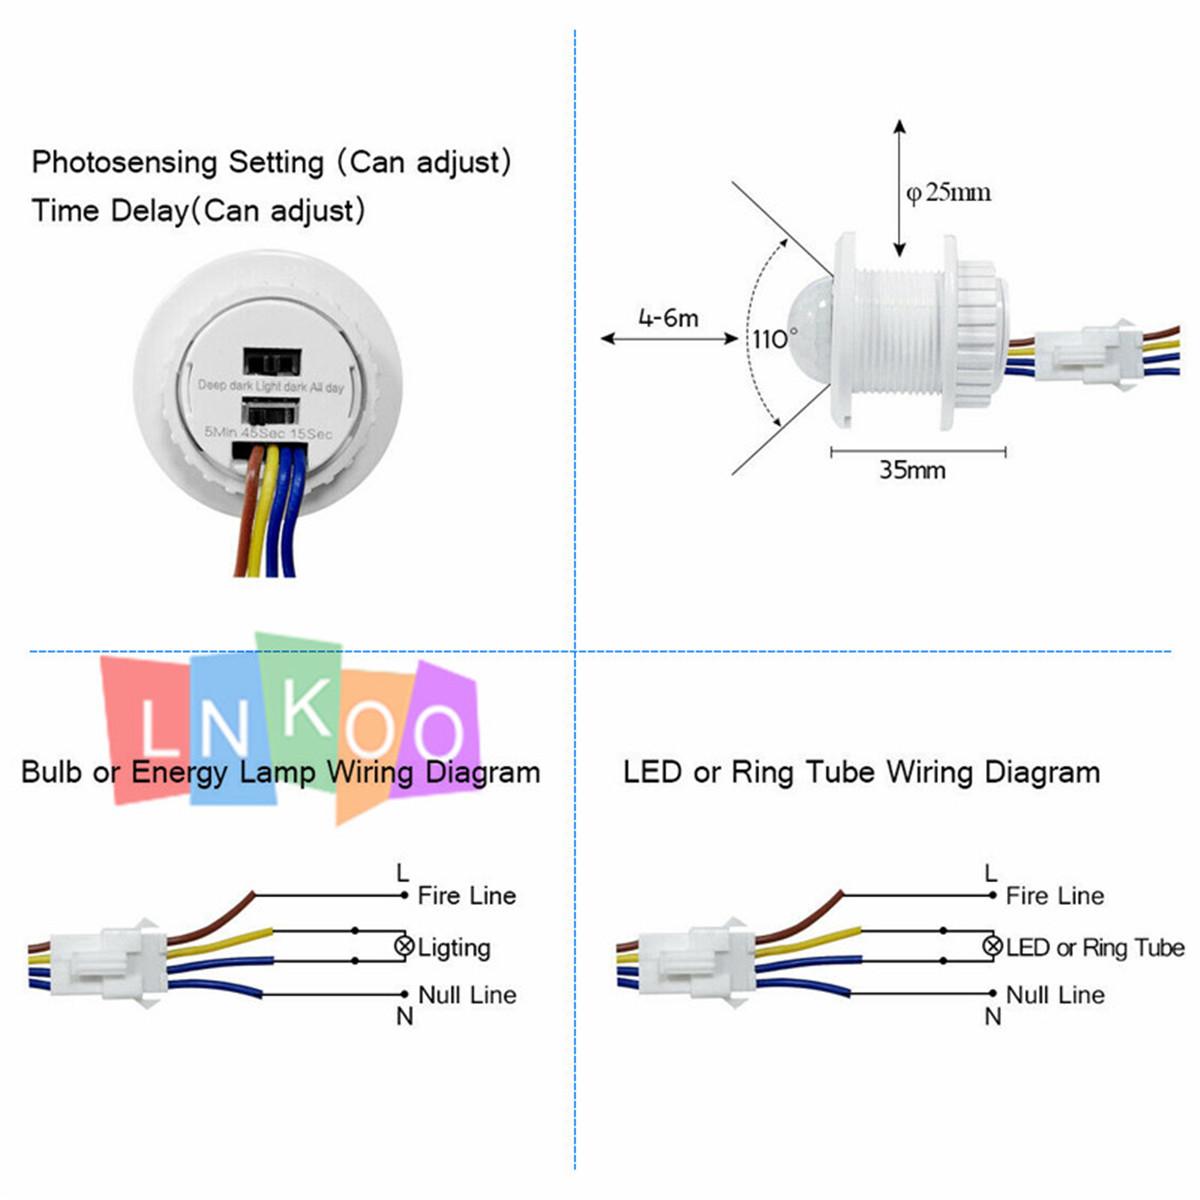 [NRIO_4796]   110/220V AC PIR Infrared Body Motion Sensor Detector Control Switch Light  Lamp | eBay | Light Sensor Wiring Diagram 110 |  | eBay